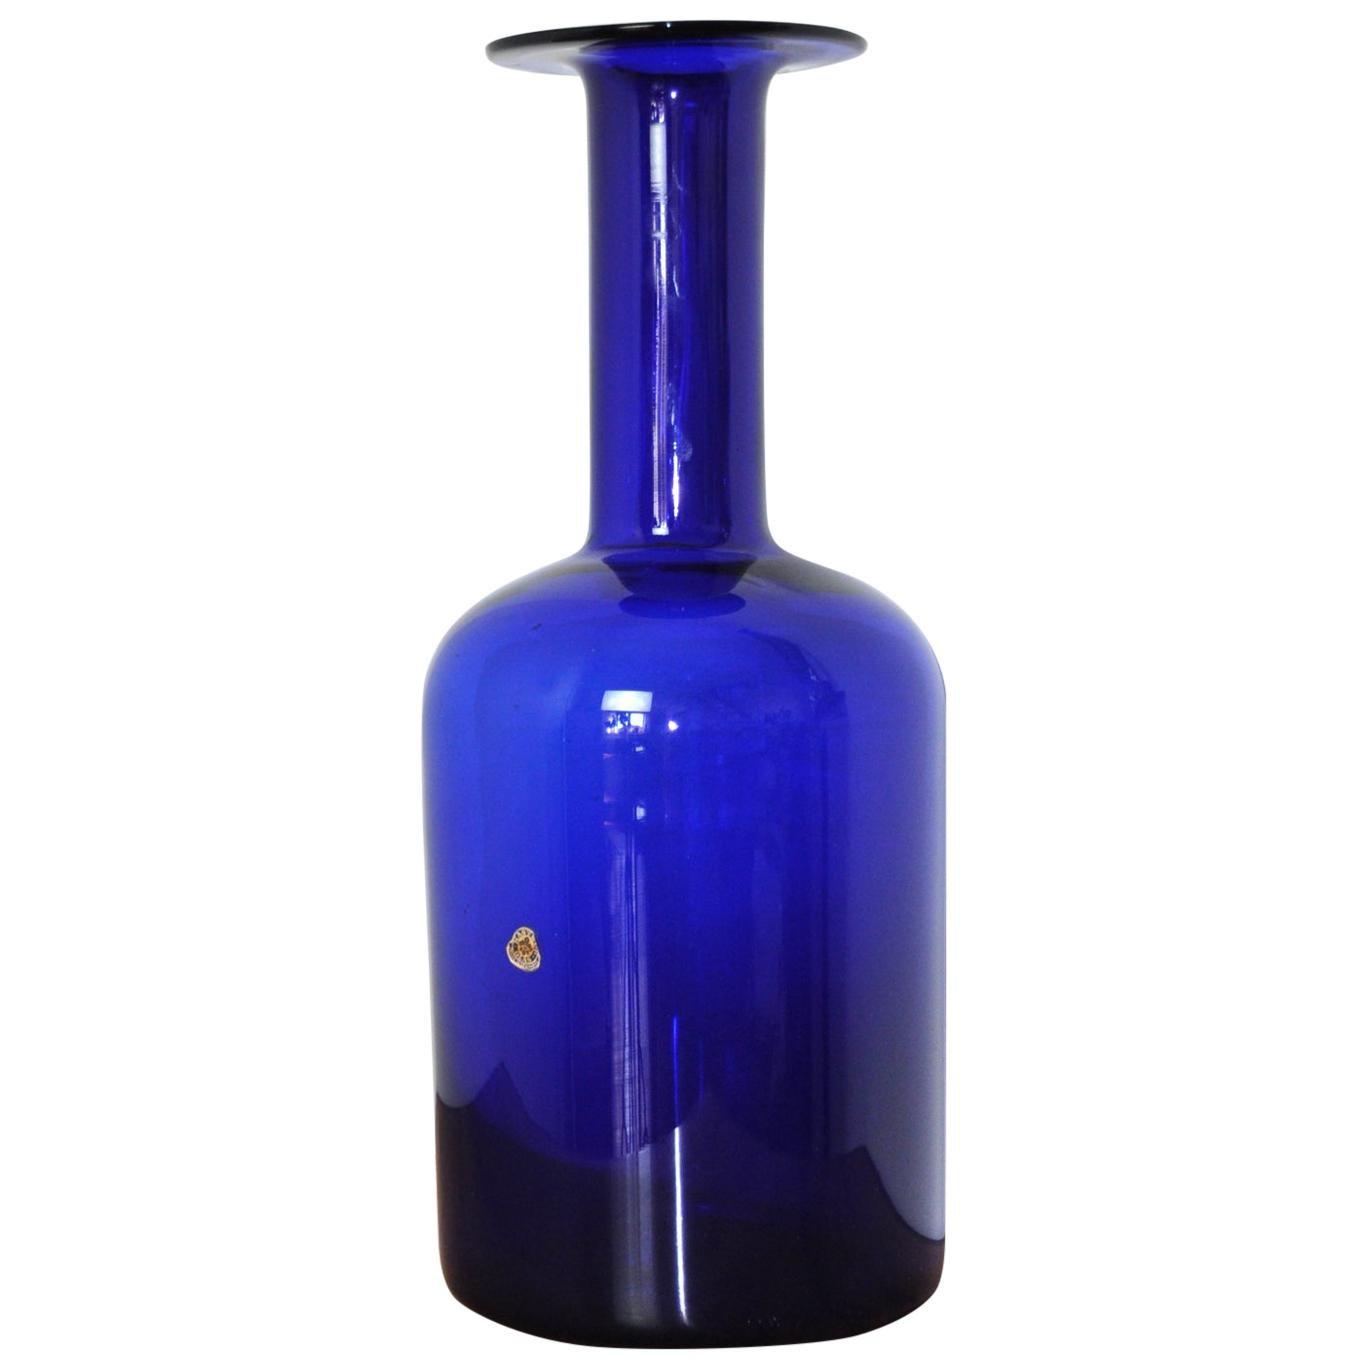 Scandinavian Modern Cobalt Blue Vase by Otto Brauer for Holmegaard Denmark 1960s